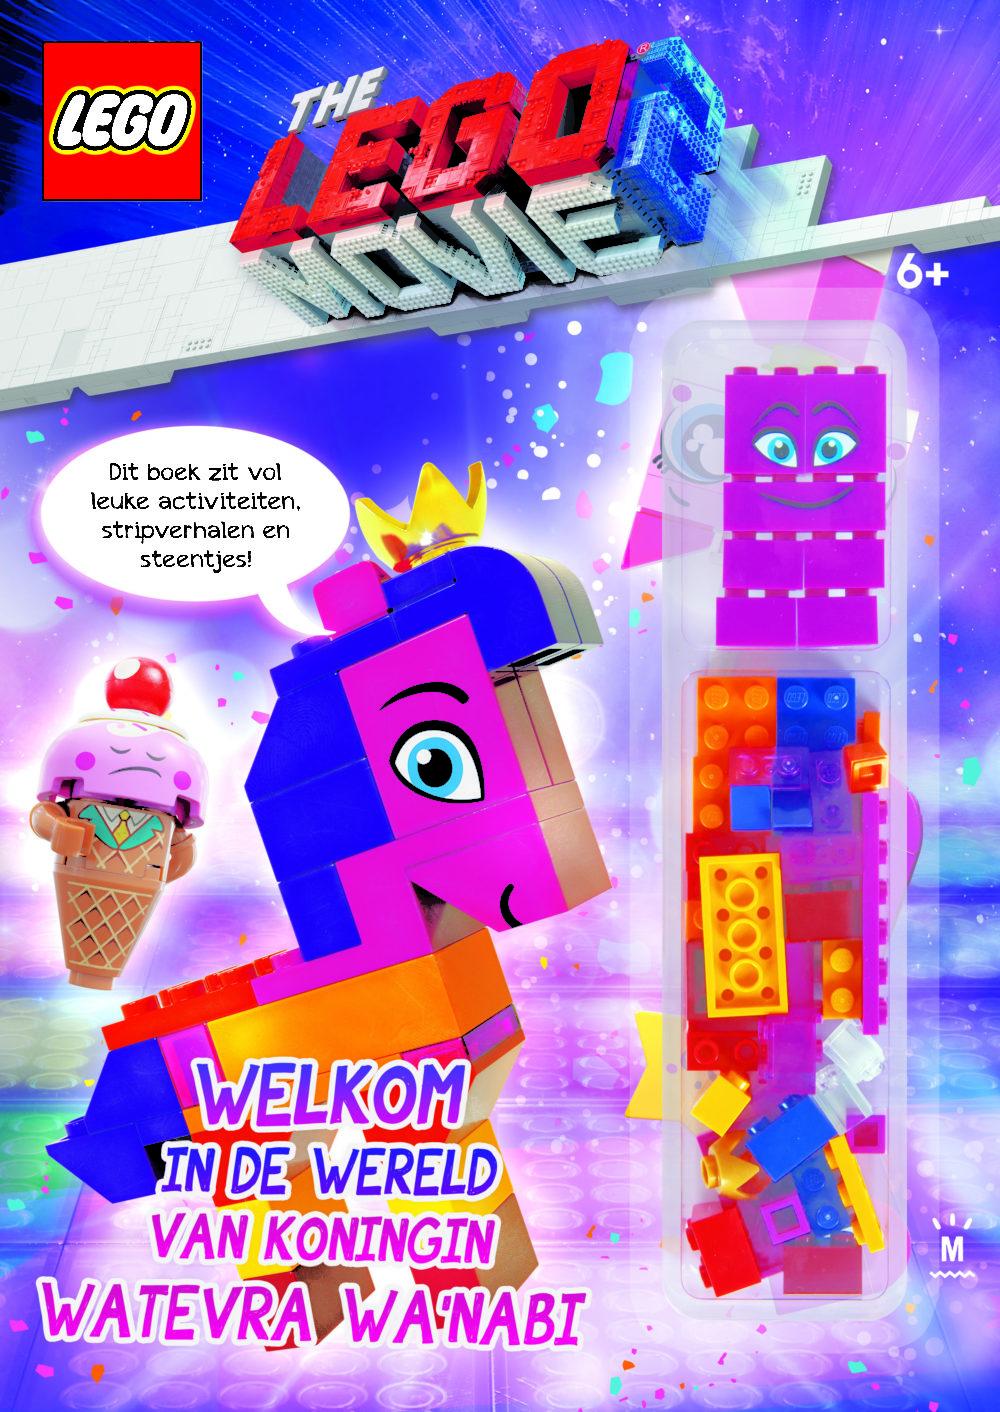 LEGO Special LEGO MOVIE 2